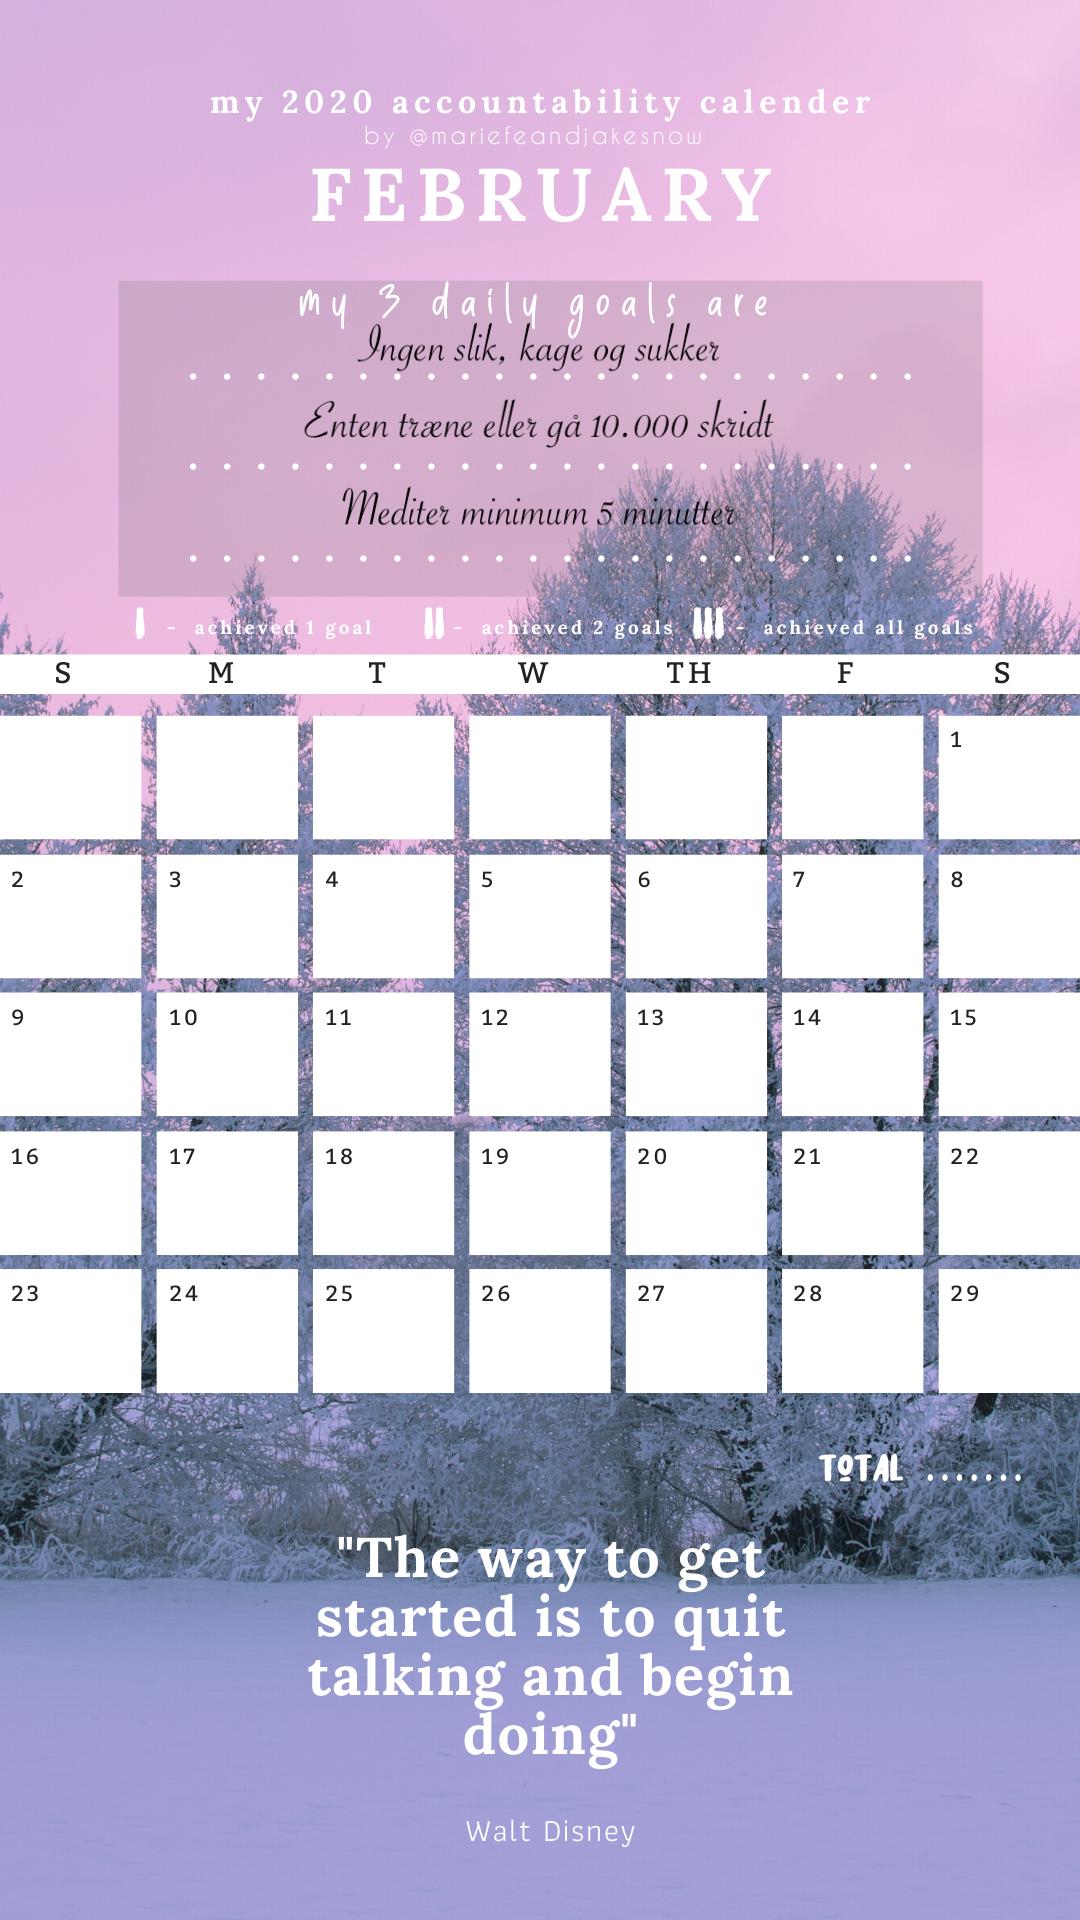 Accountability Calendar - February.png